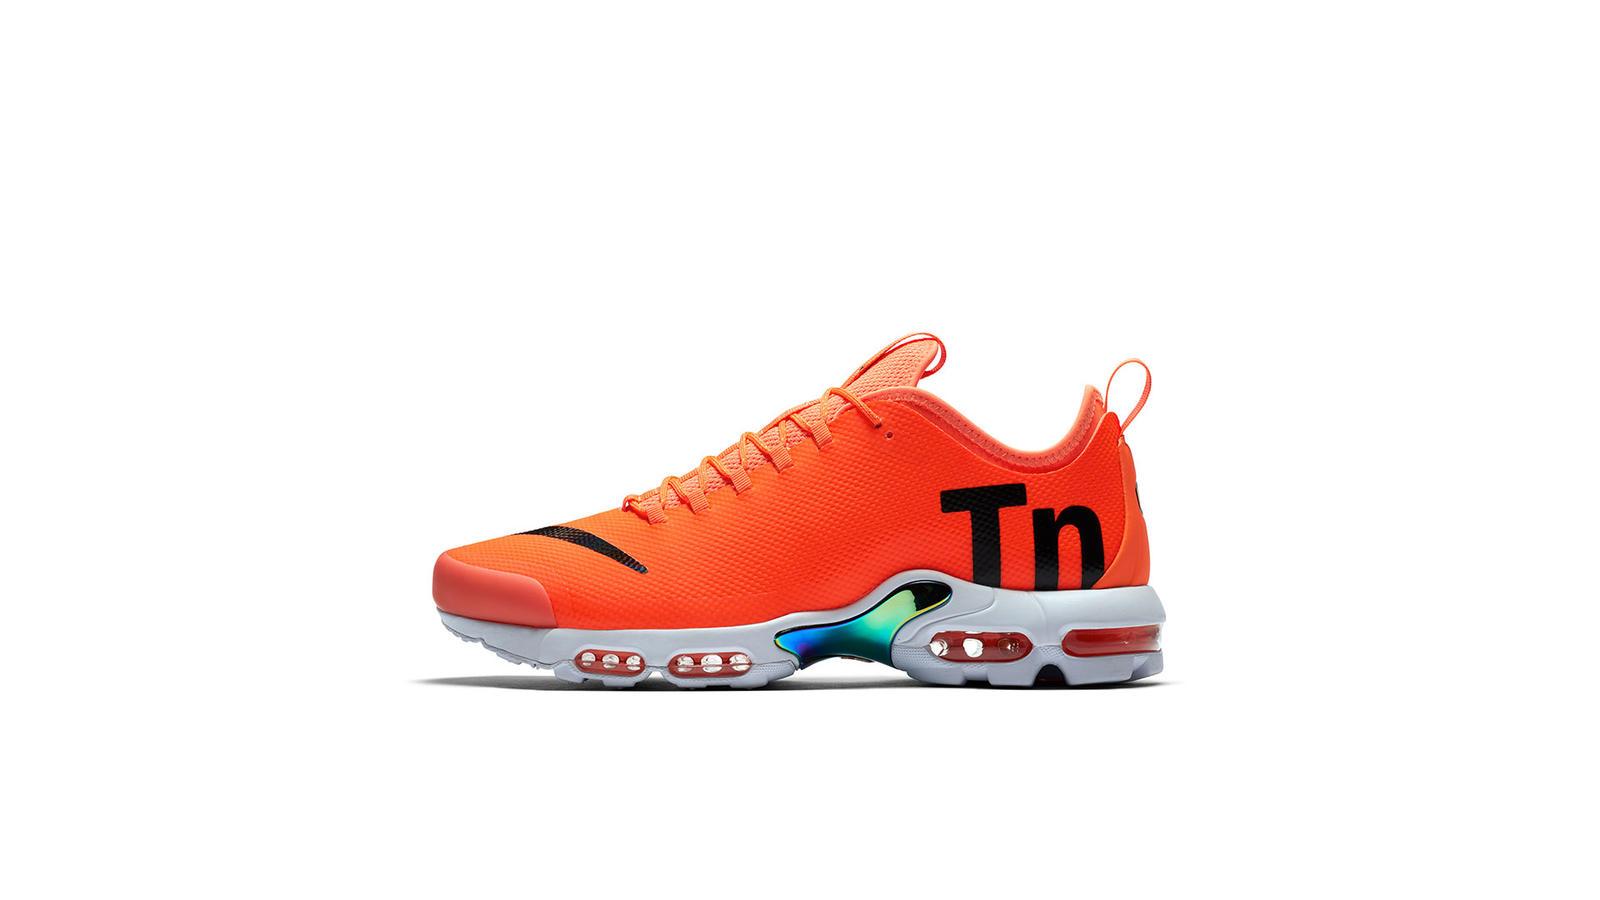 Nike Mercurial TN orange